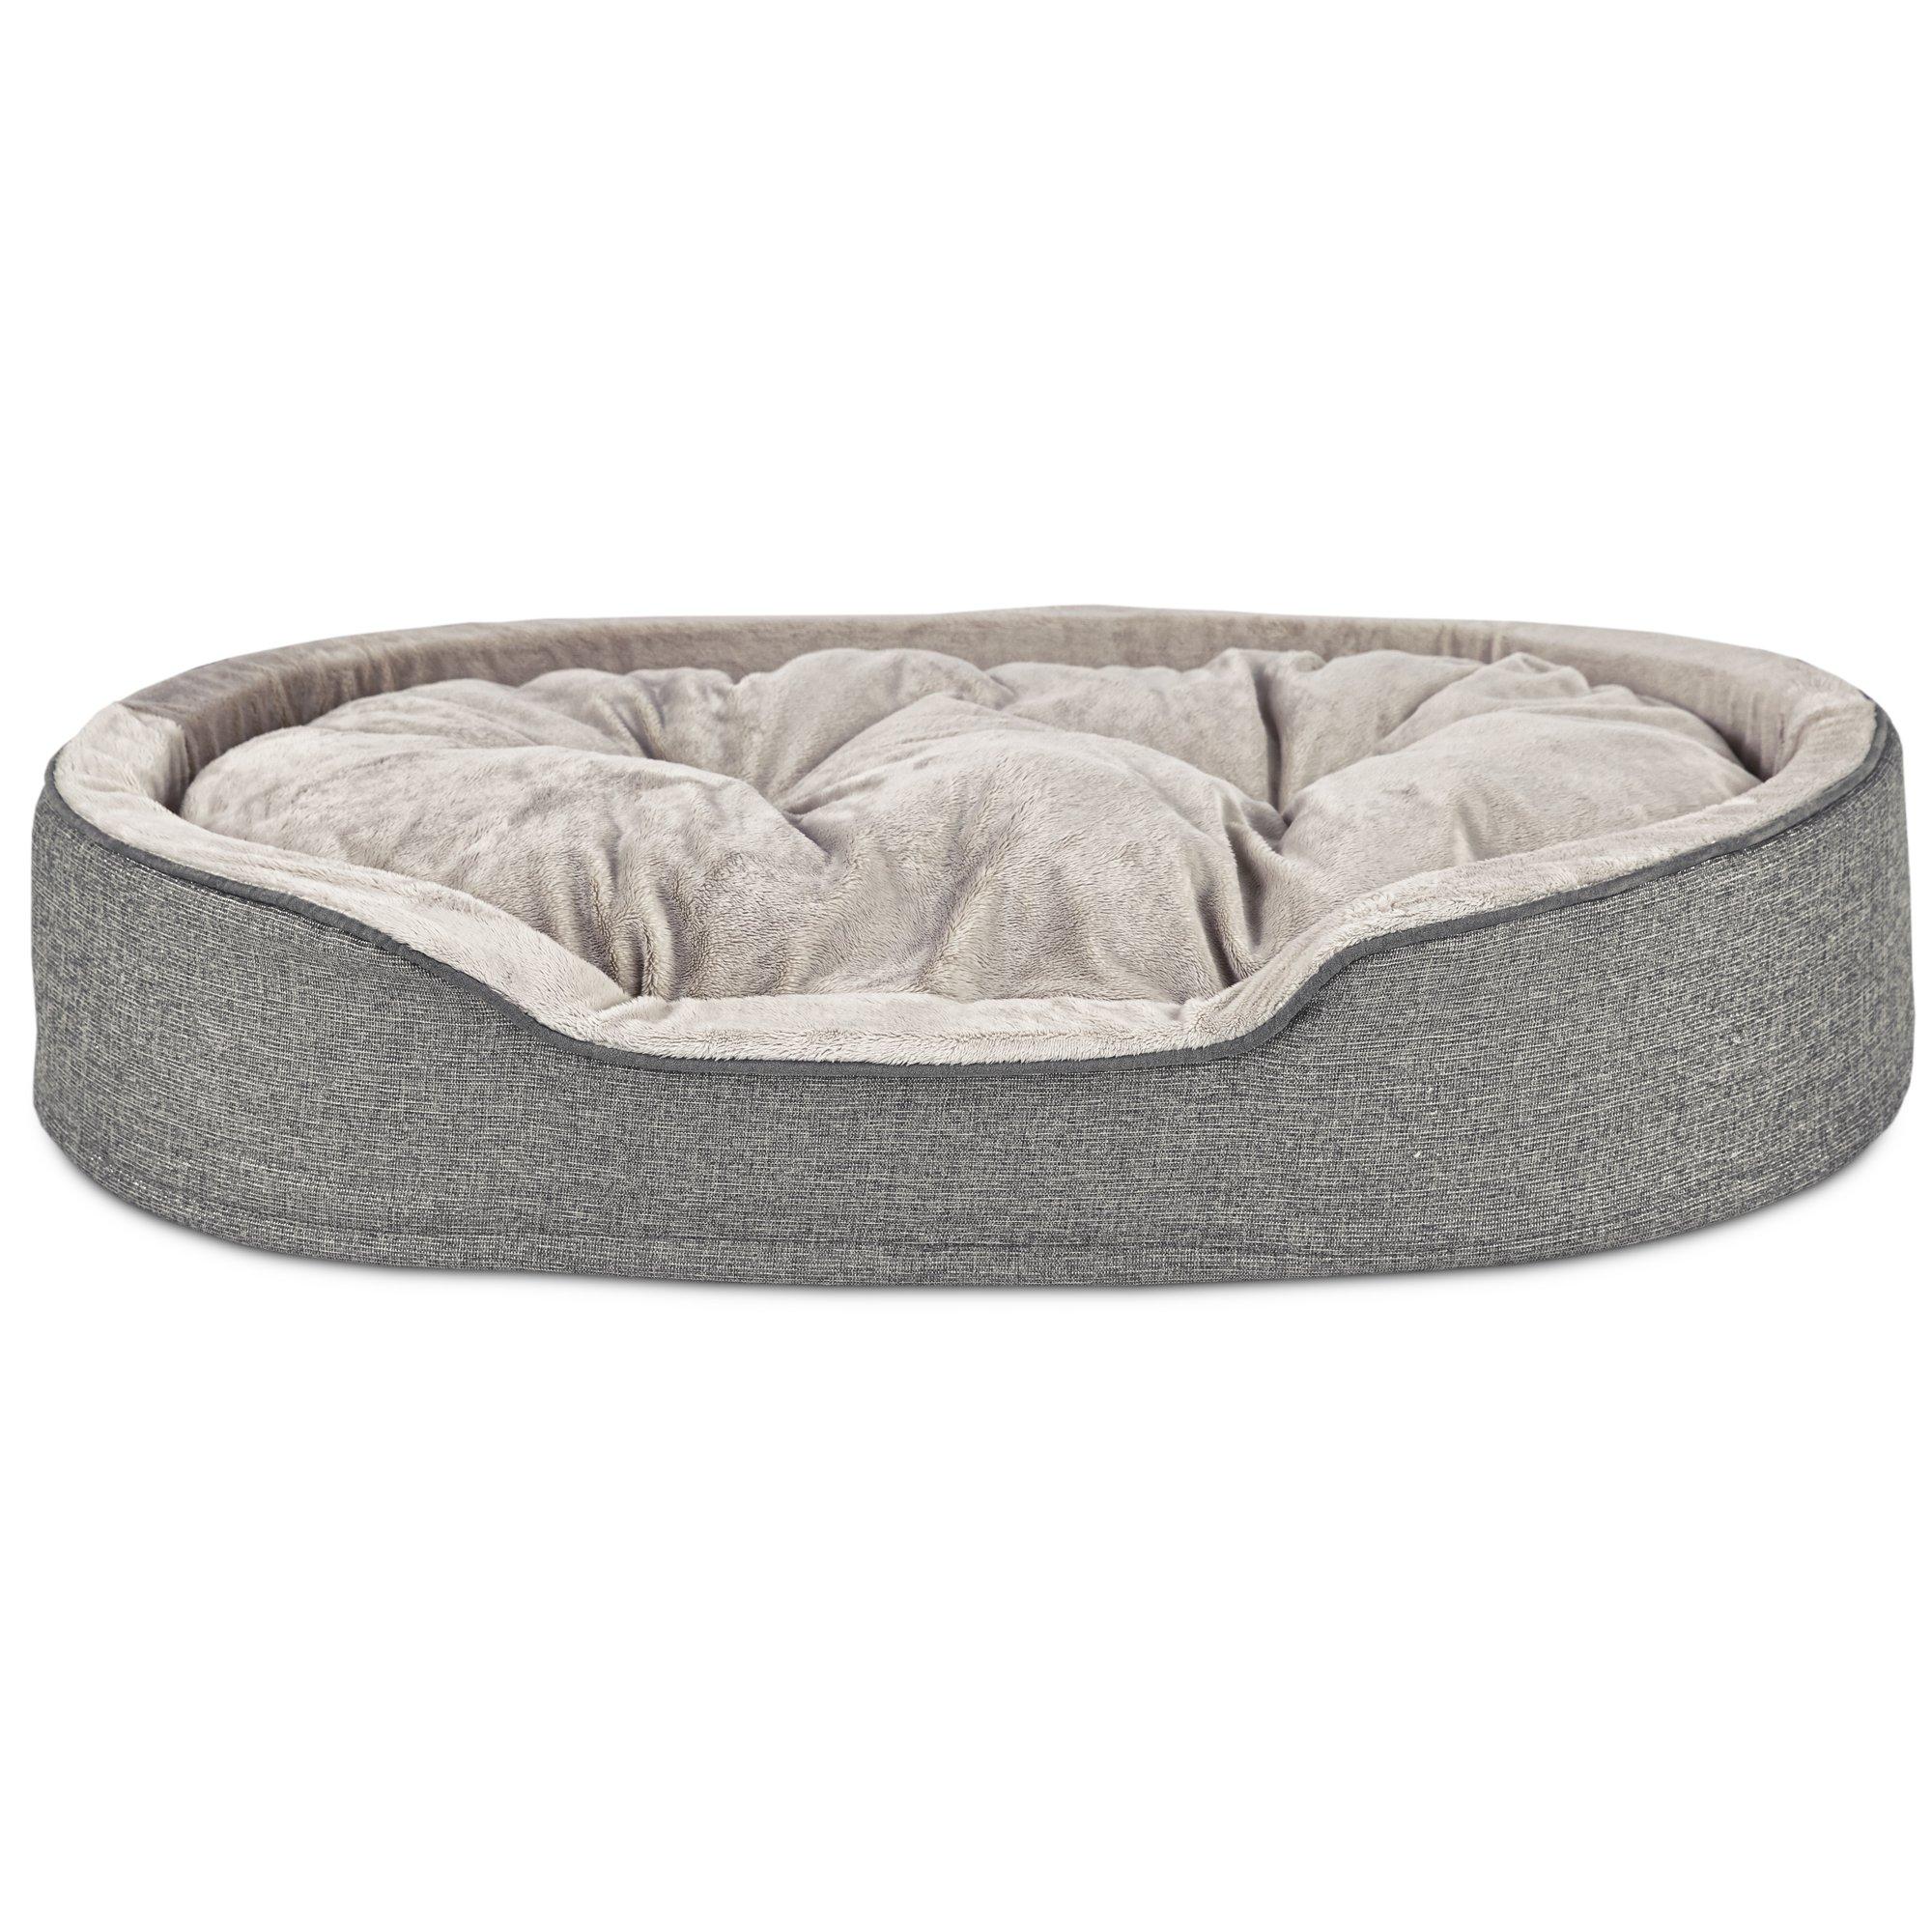 Harmony Orthopedic Cuddler Dog Bed in Silver